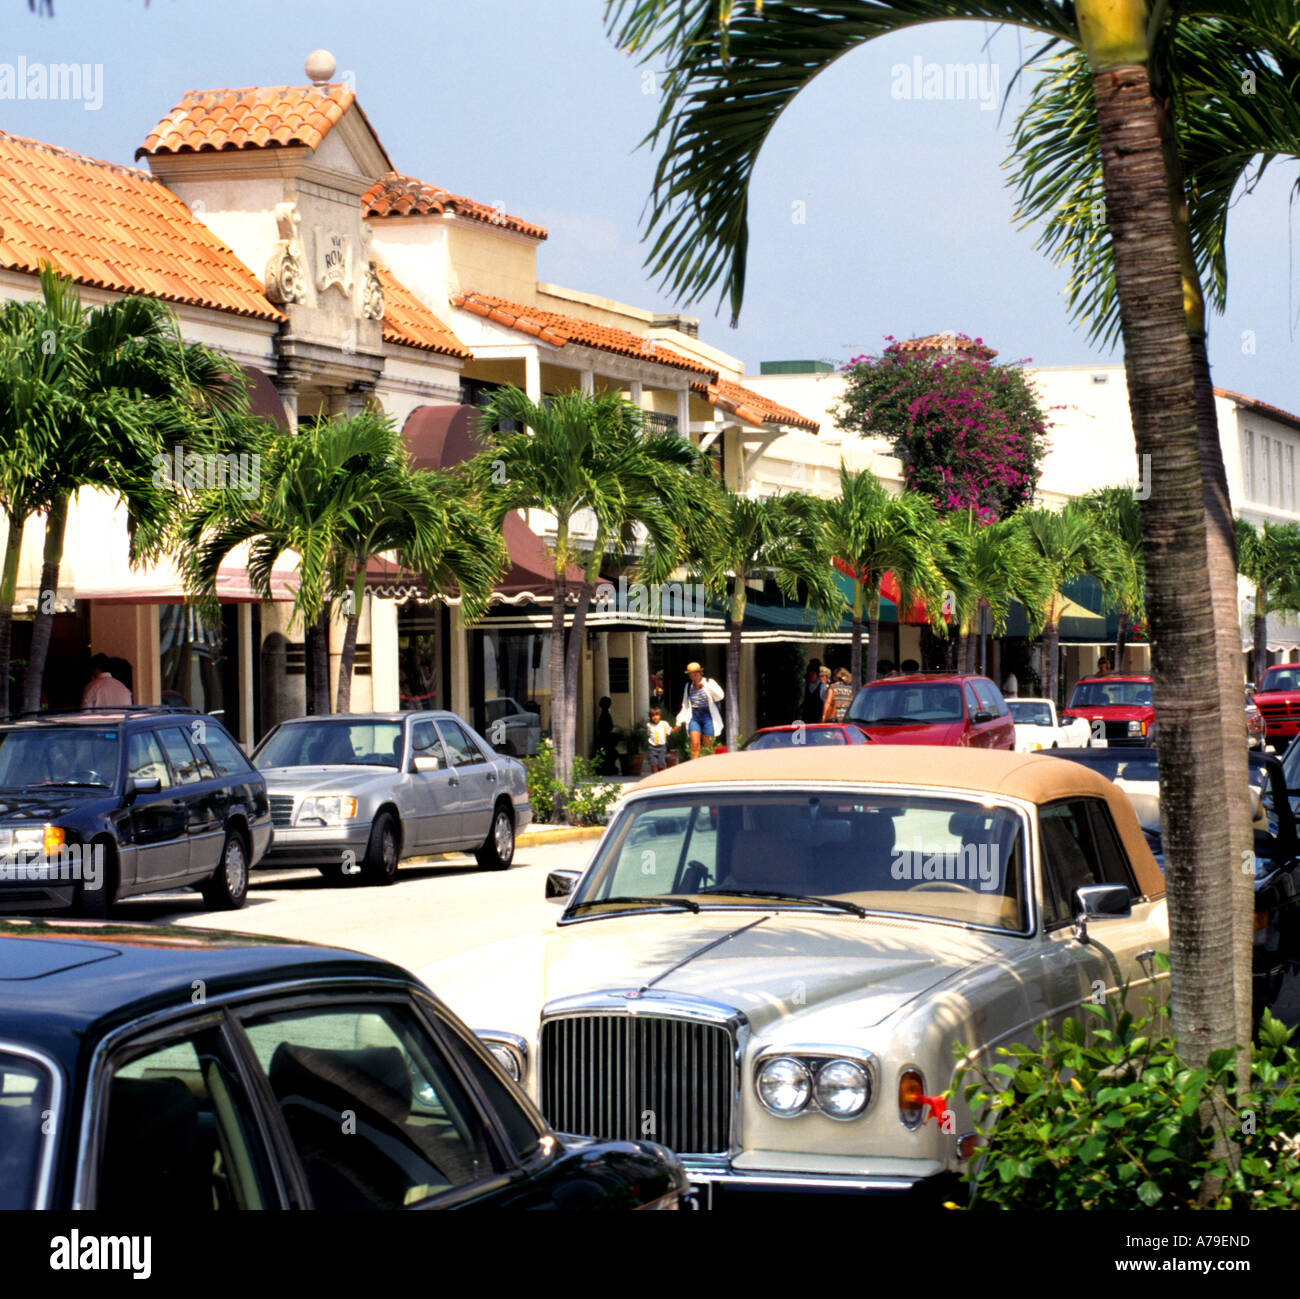 Florida fashion shops classy Palm Beach Rolls Royce Worth Avenue Stock Photo